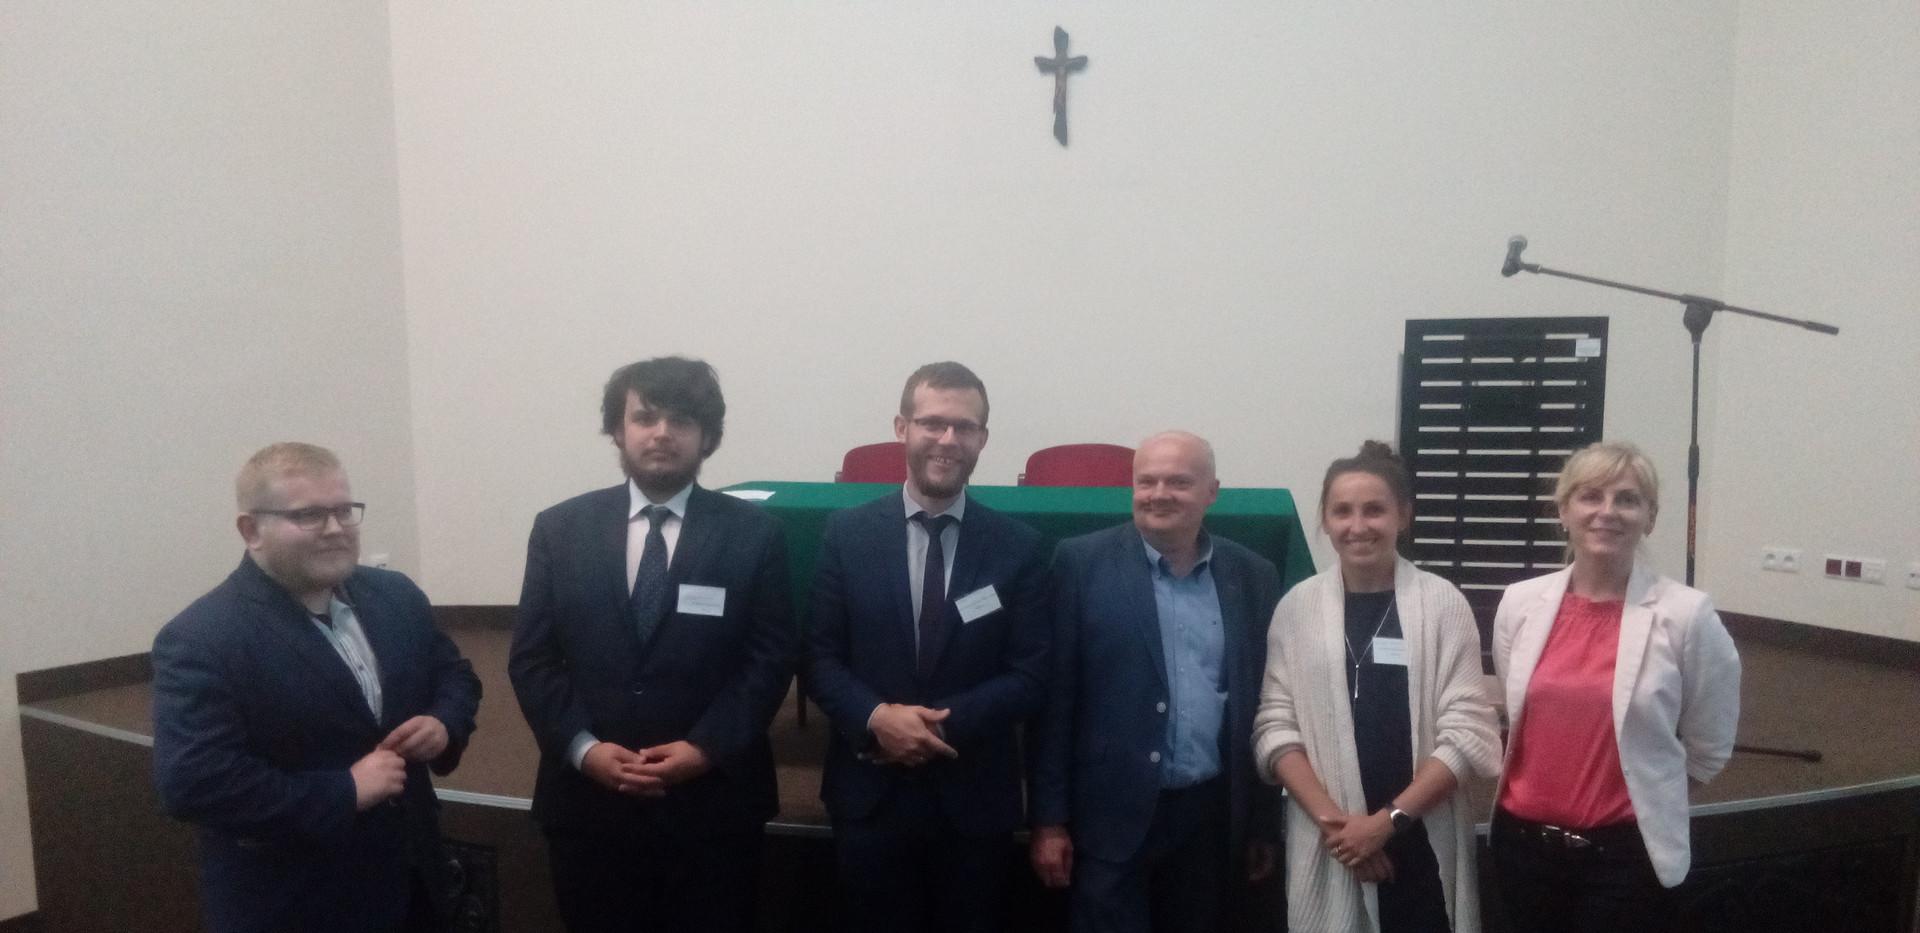 Dr Arkadiusz Meller, mgr Maciej Stawiskidr, dr Arkadiusz Fordoński, prof. Grzegorz Radomski, mgr Paulina Chmielecka i mgr Sylwia Łukasik-Gębska